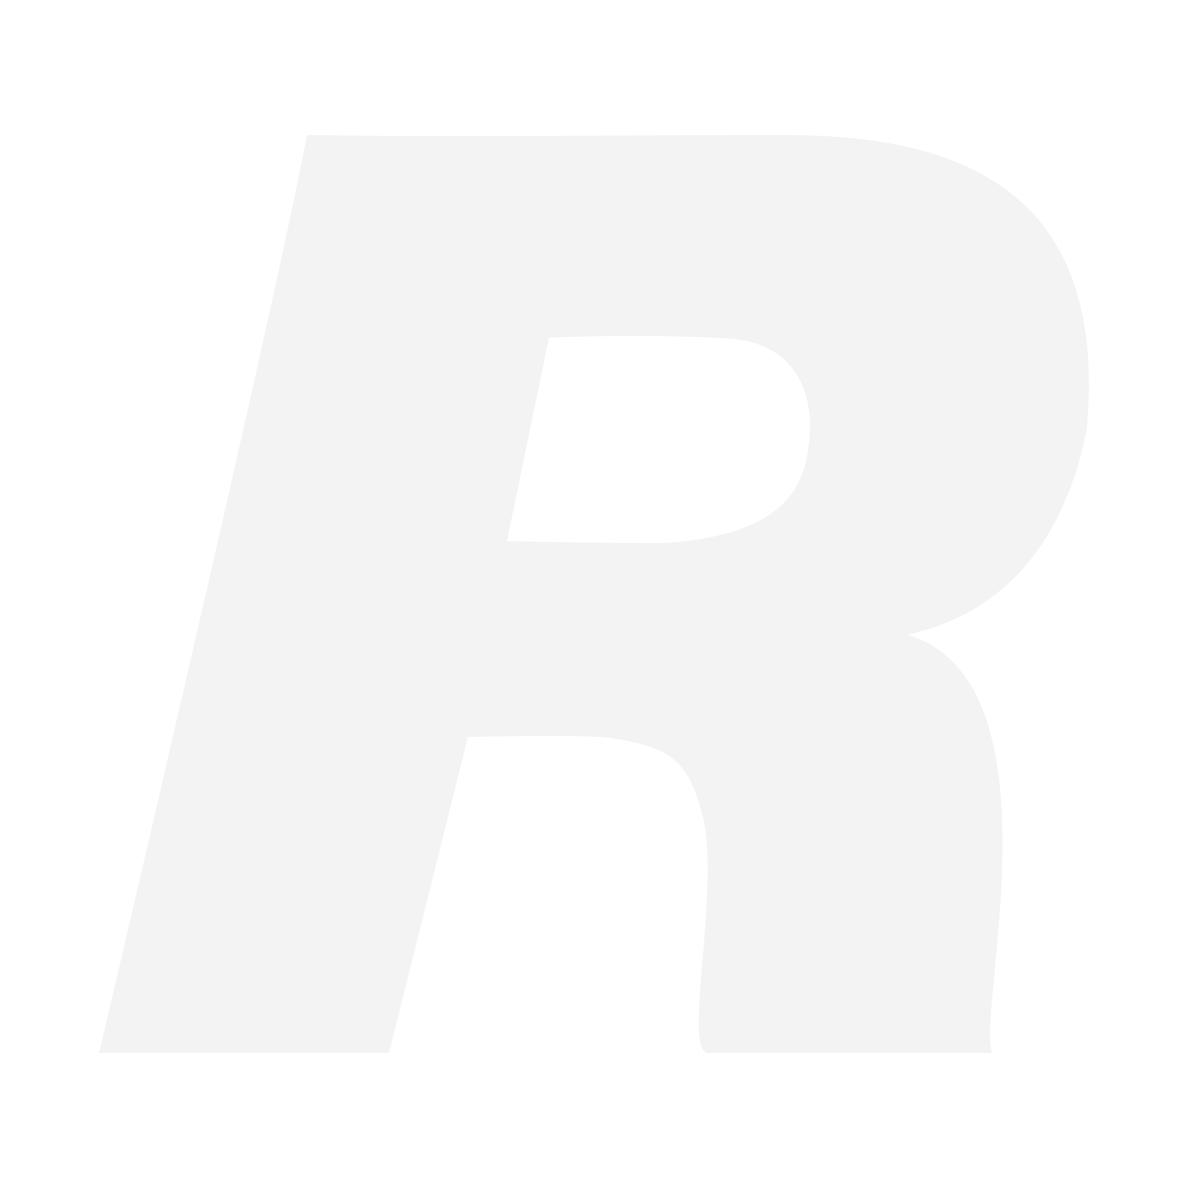 LASTOLITE L6921 Black/White Reversible 180cm x 275cm